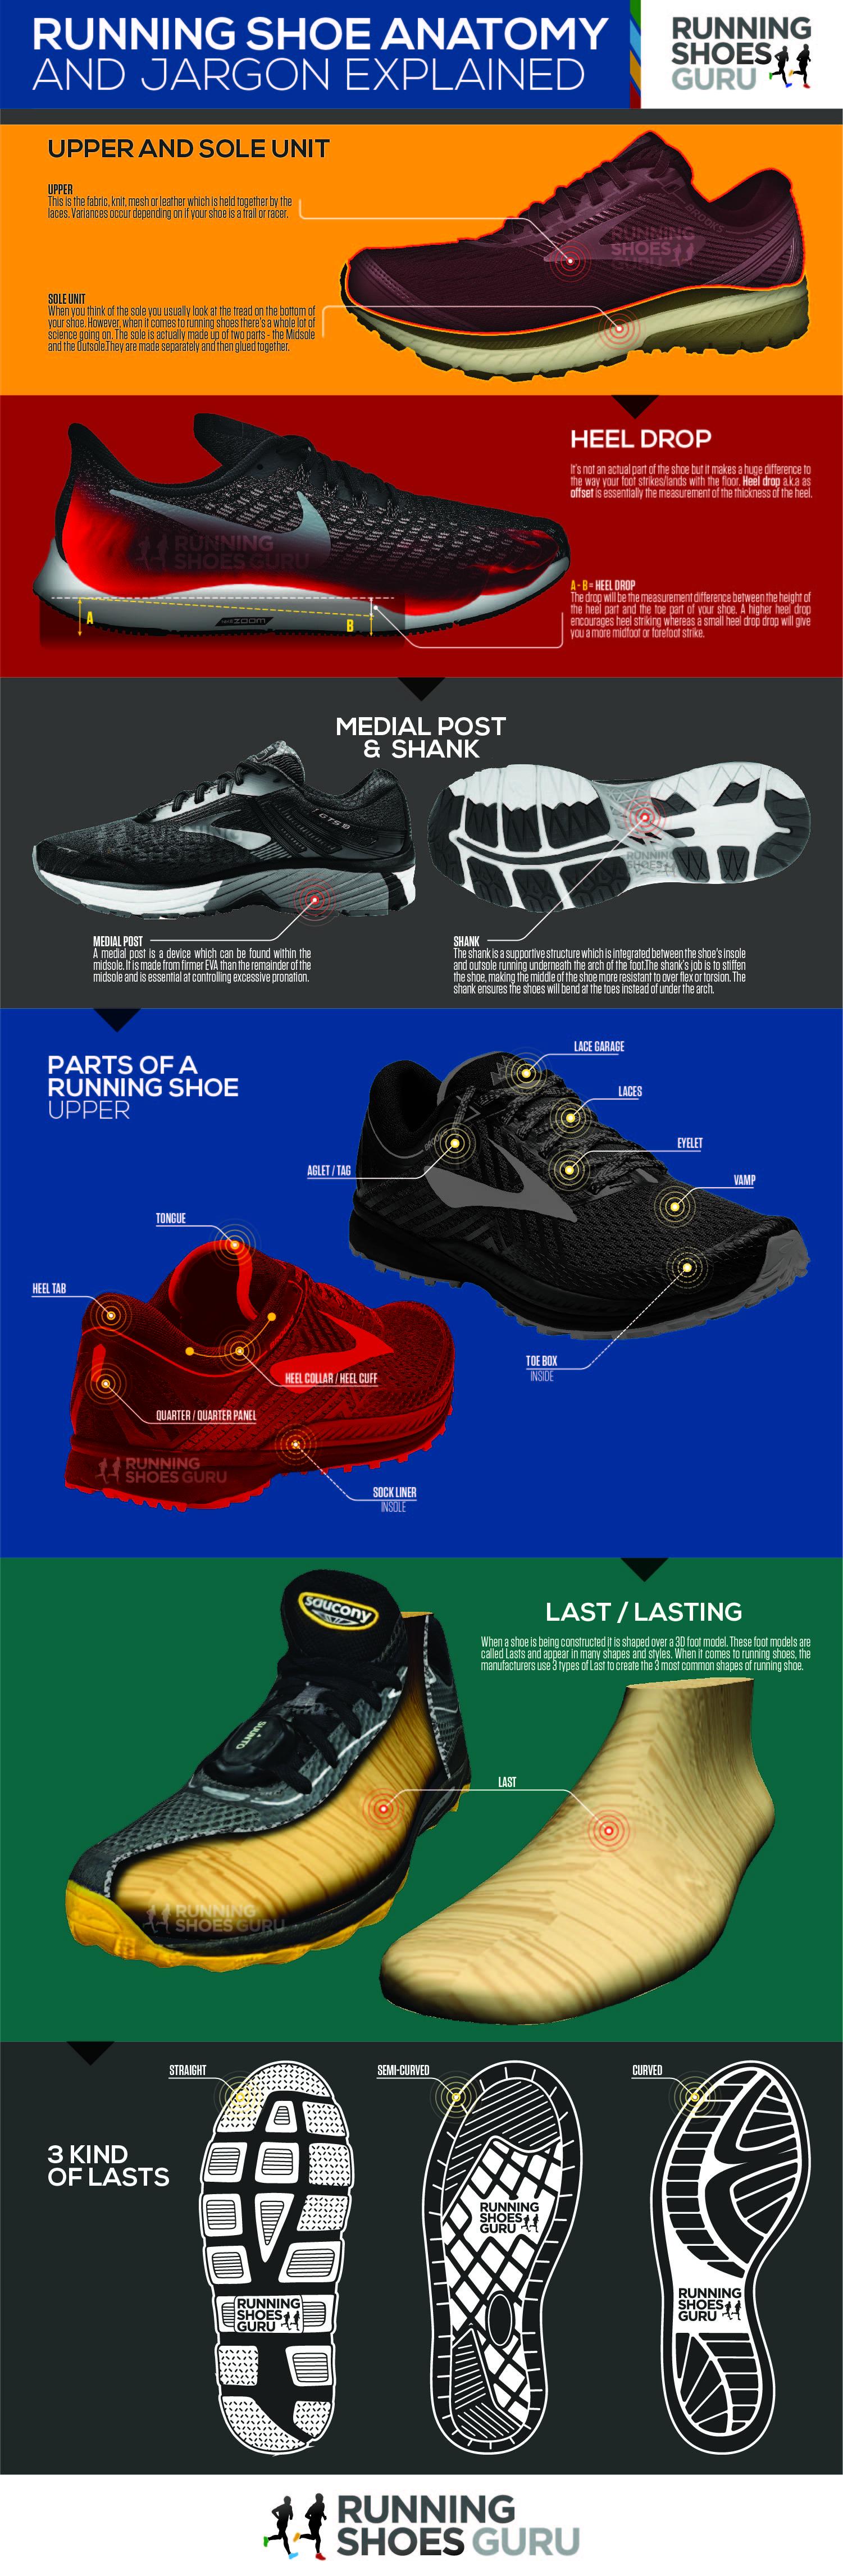 Running-Shoes-Anatomy-07-Infographic